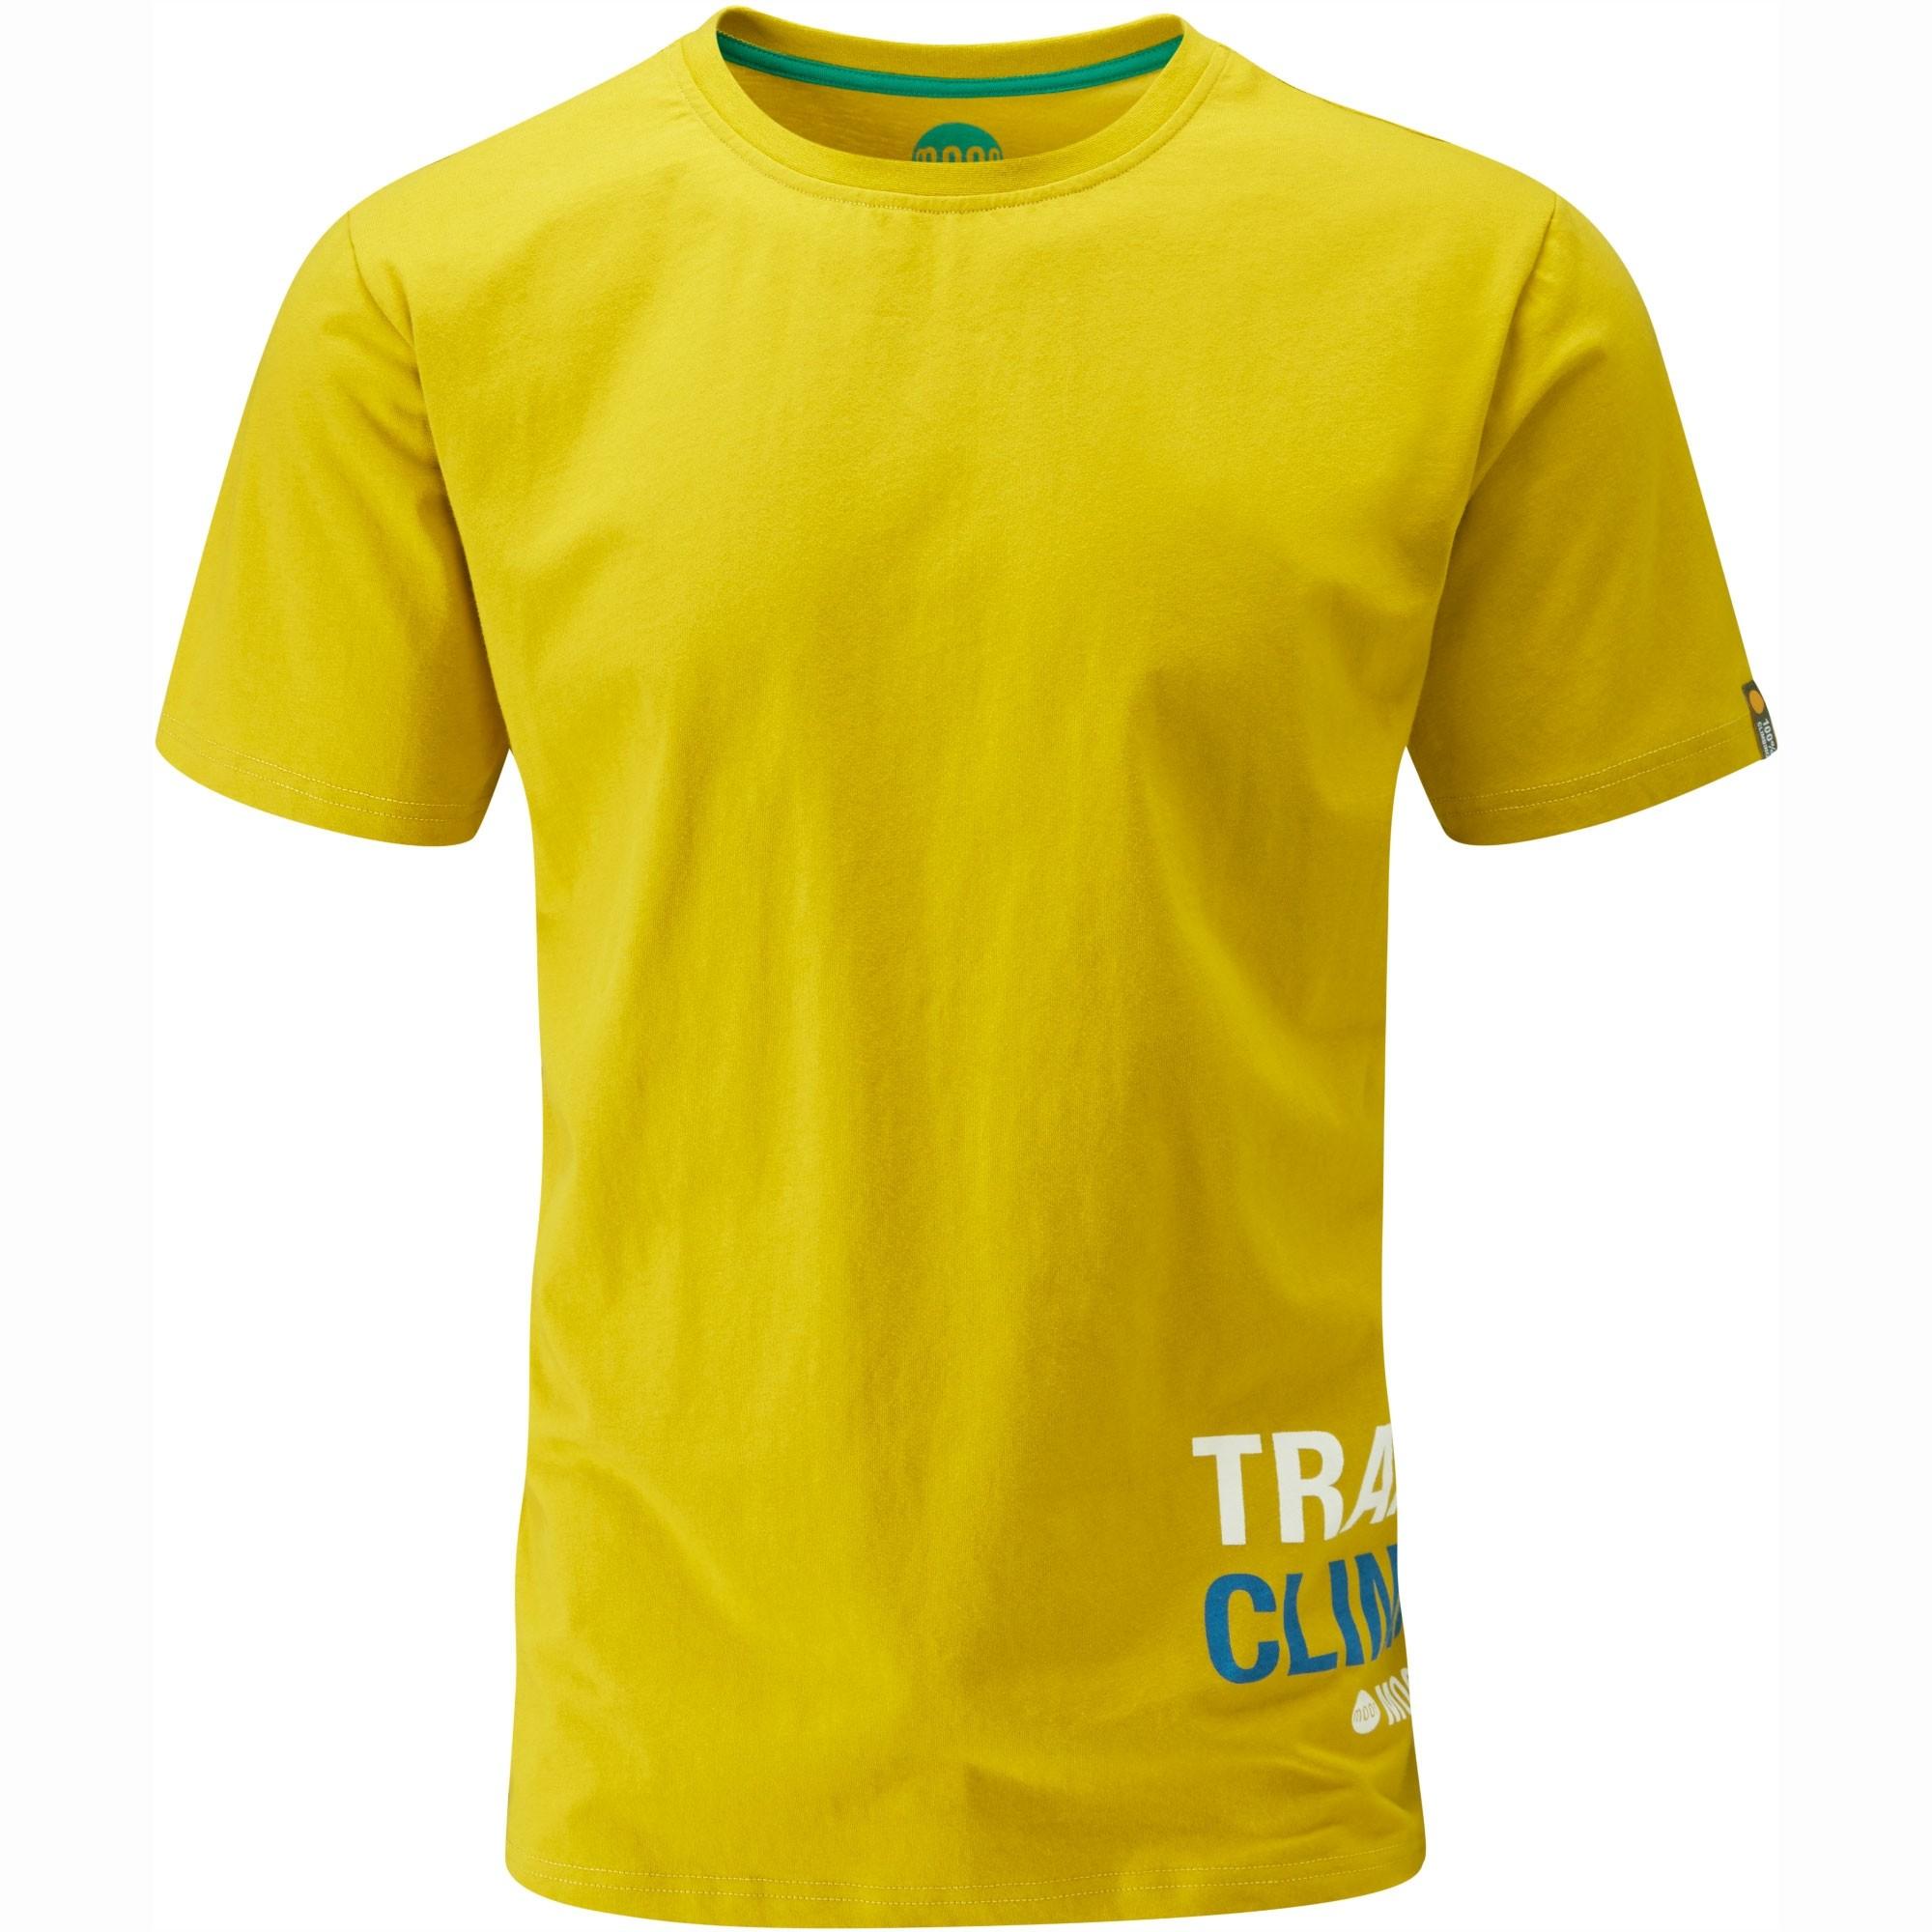 Moon Train Hard T-Shirt - Lemon Curry